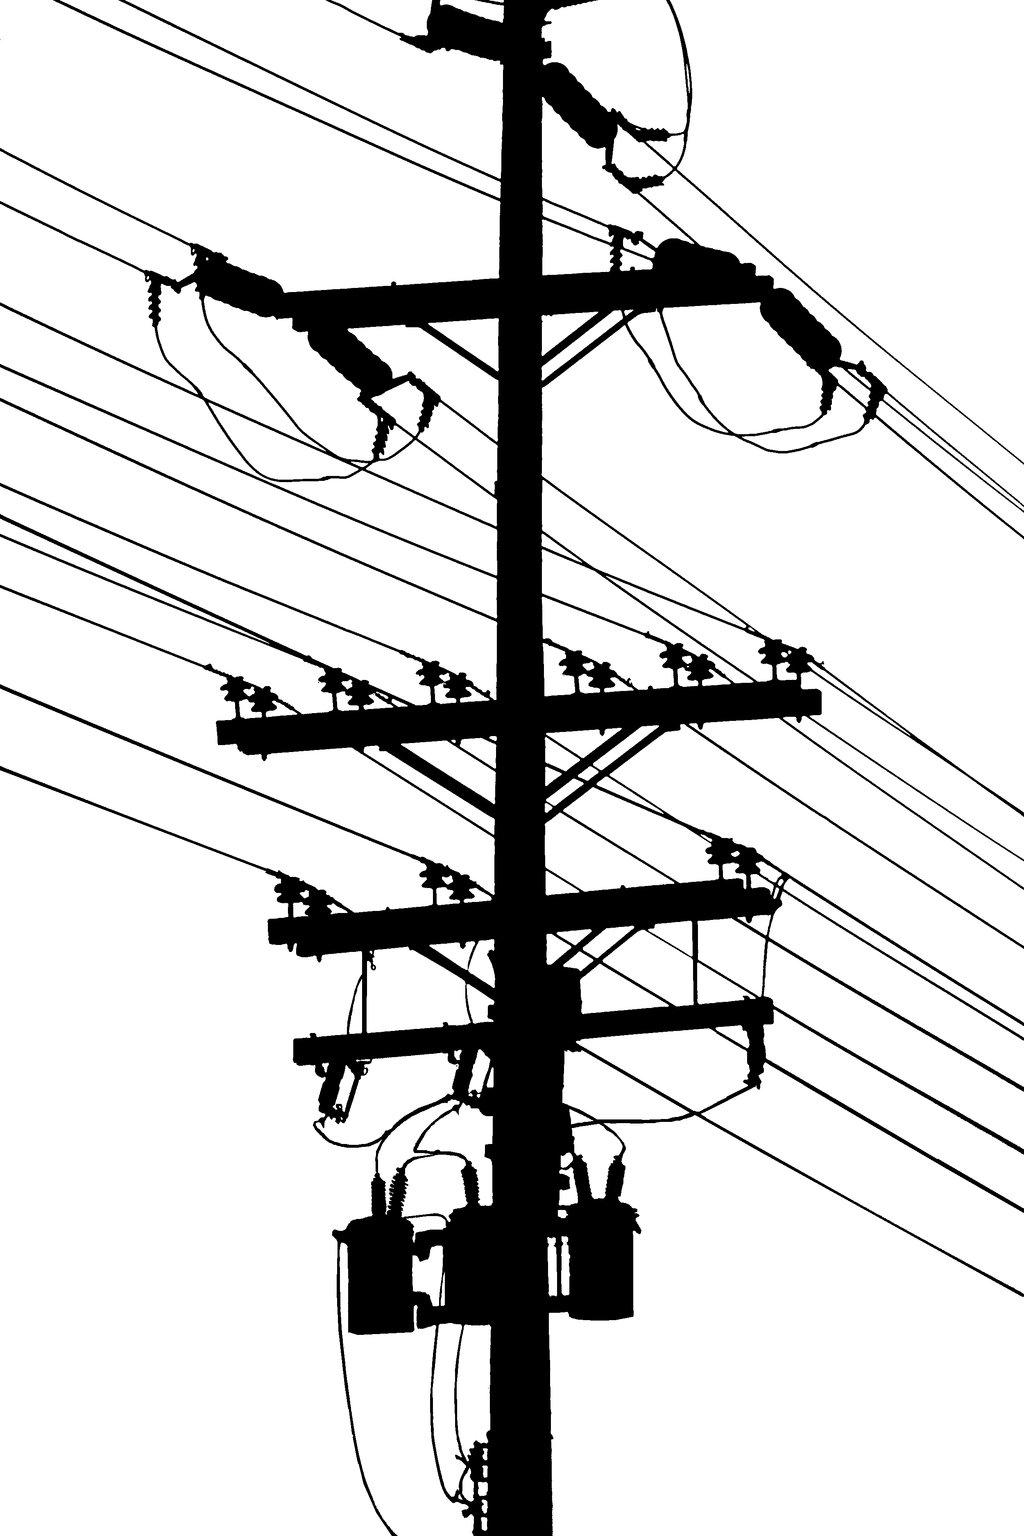 Drawn power line electrical pole Pole karen robert Pole DeviantArt